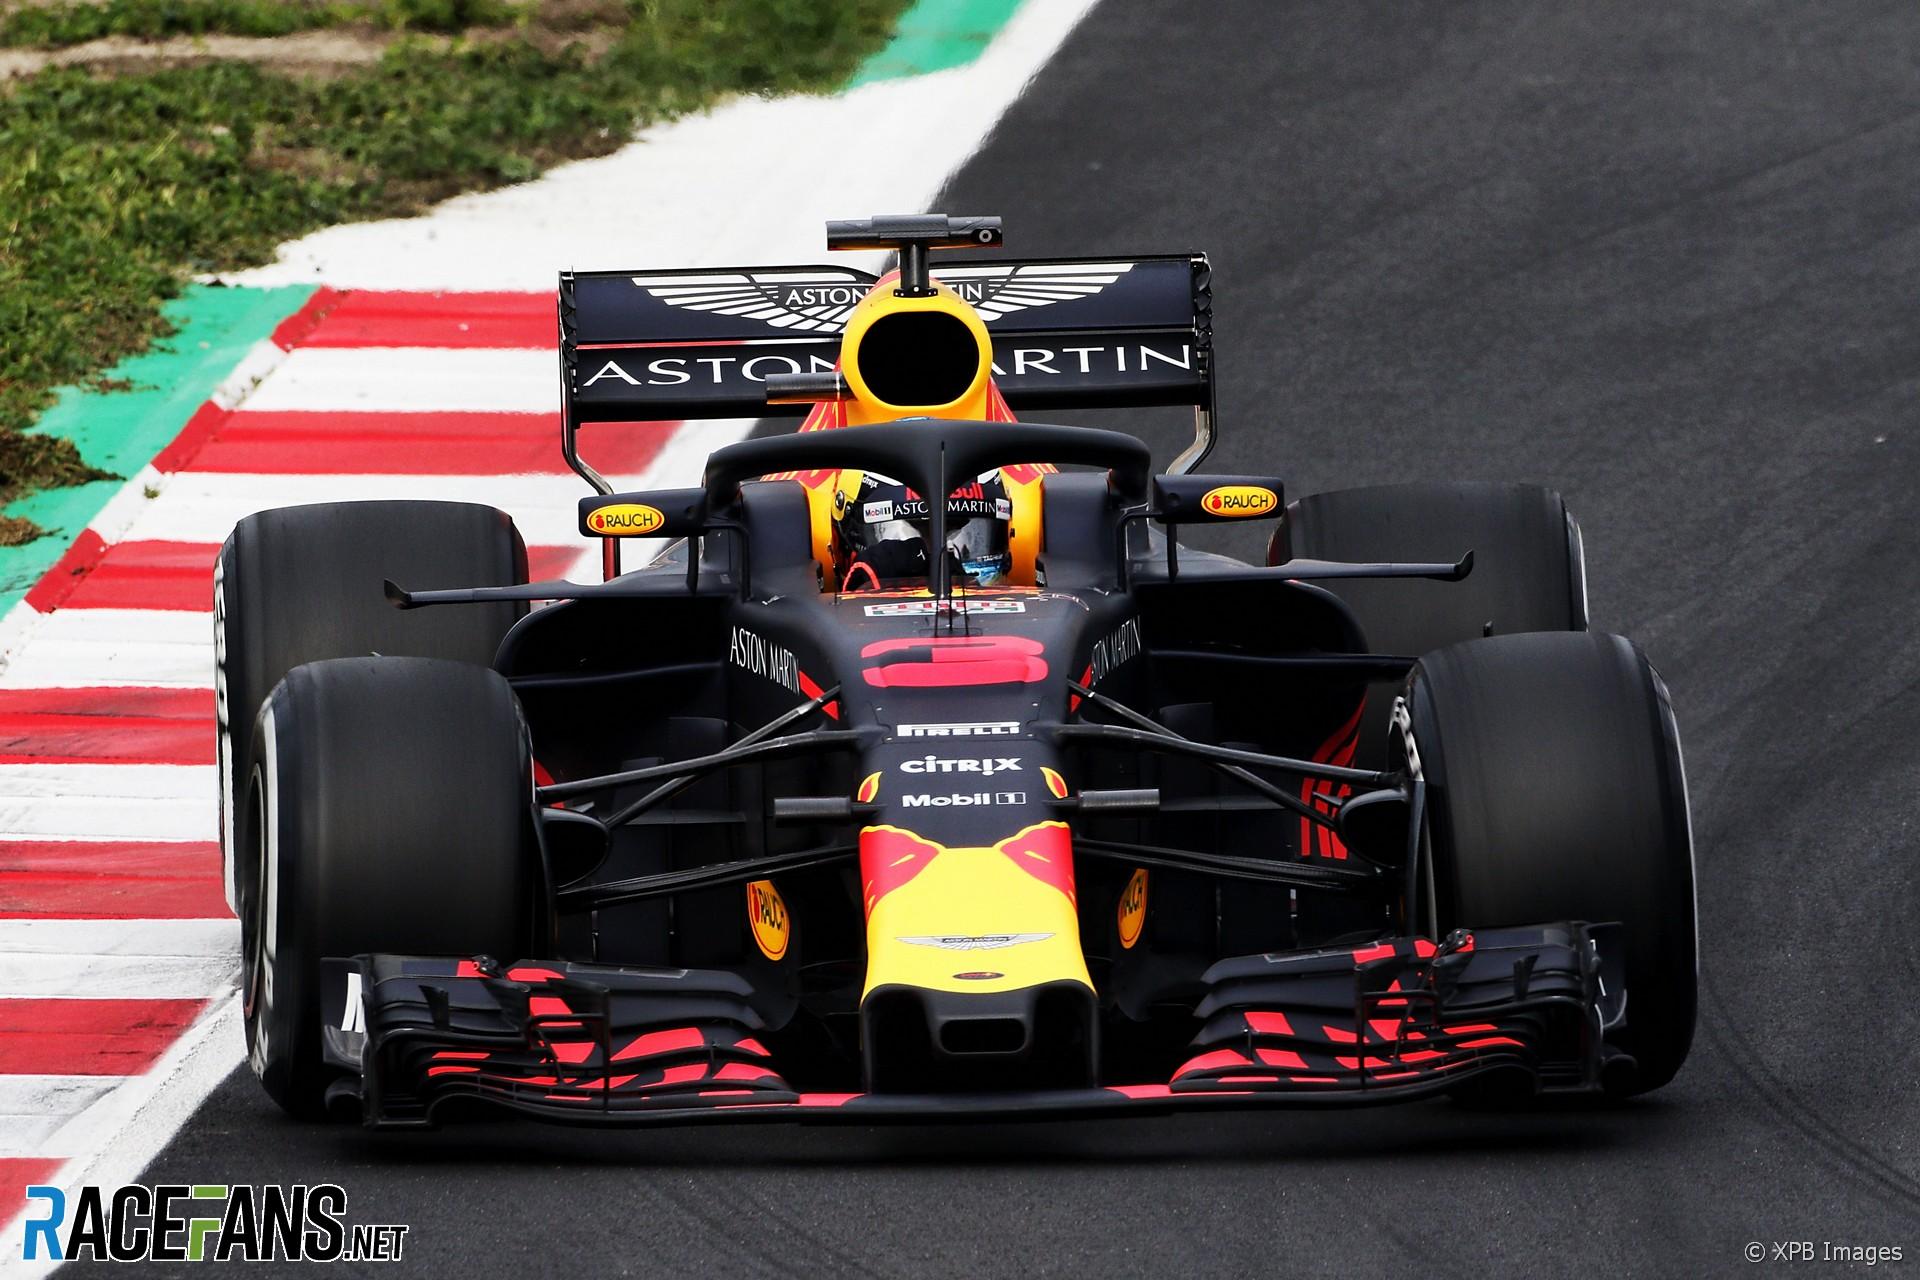 Rain Live Wallpaper Hd Ricciardo Fastest As Rain Hampers First Test Of 2018